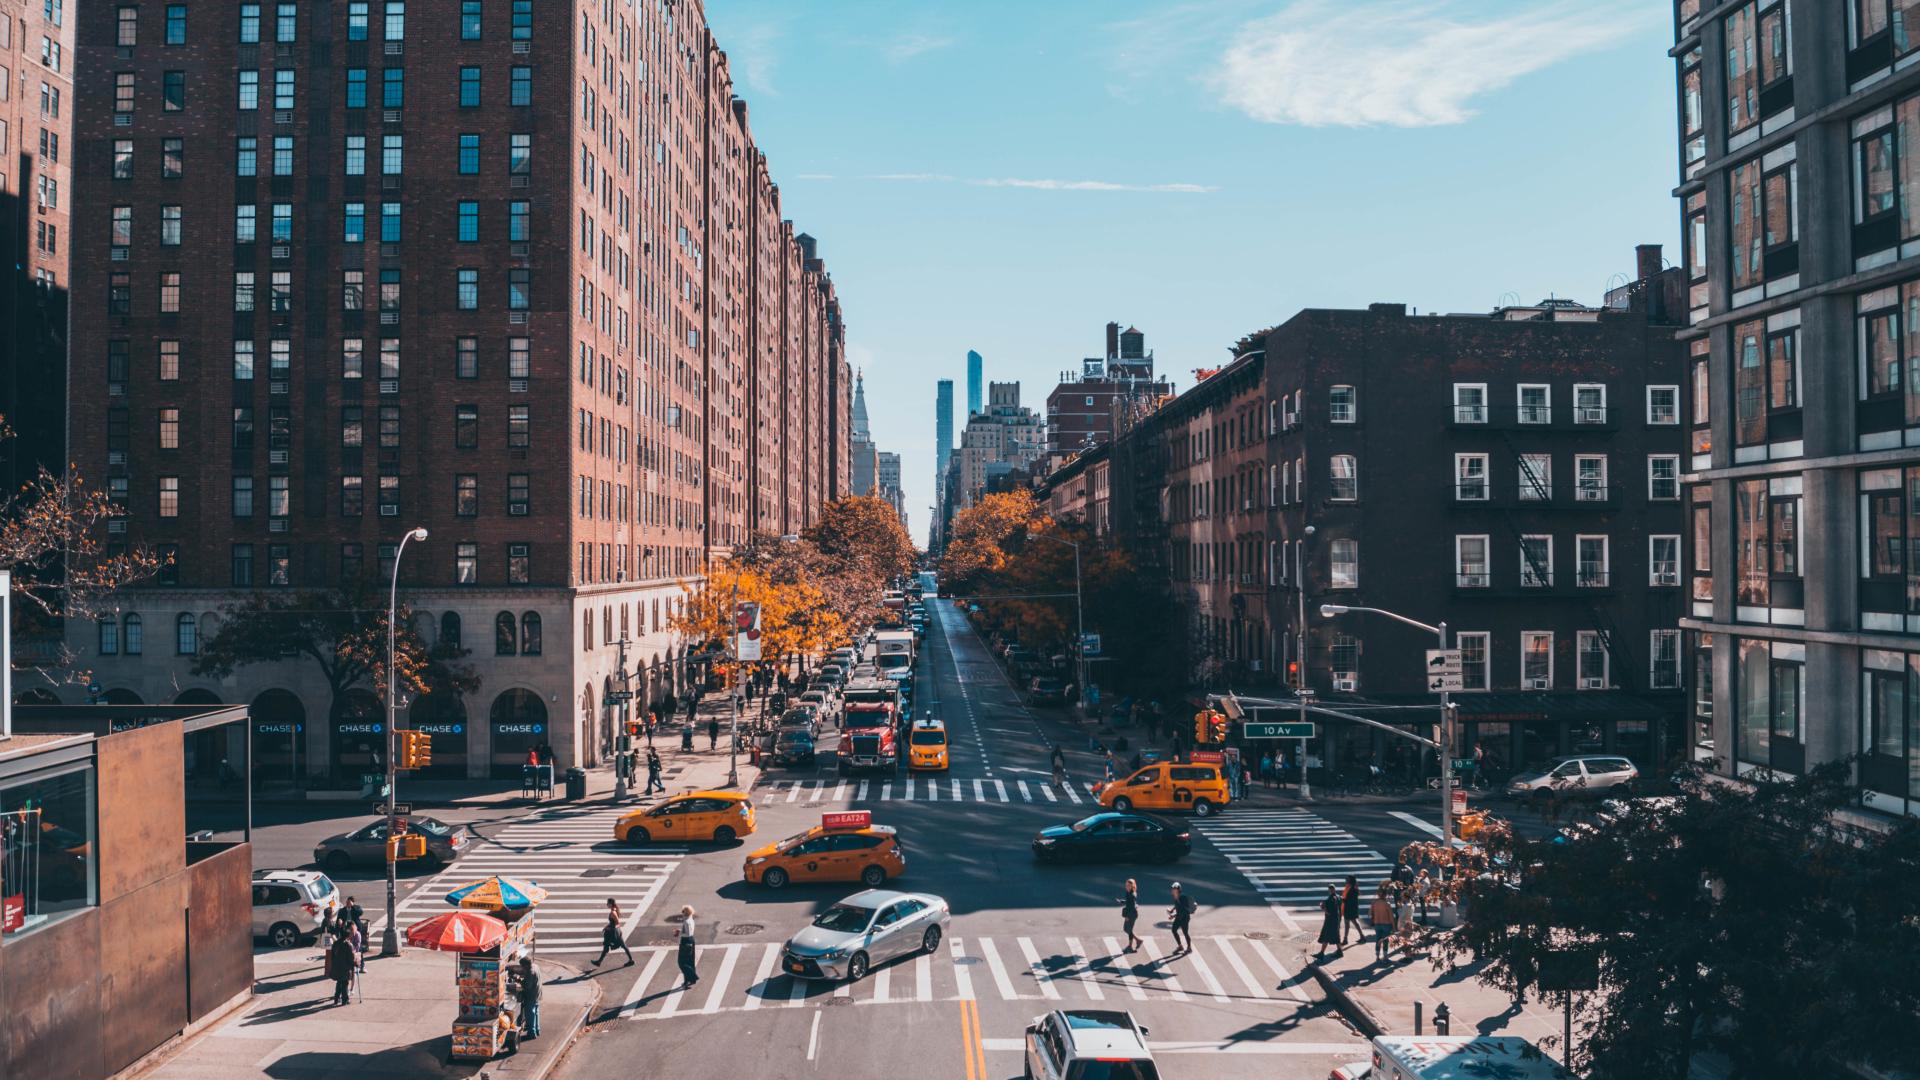 1920x1080 New York City Street Photography 1080p Laptop Full